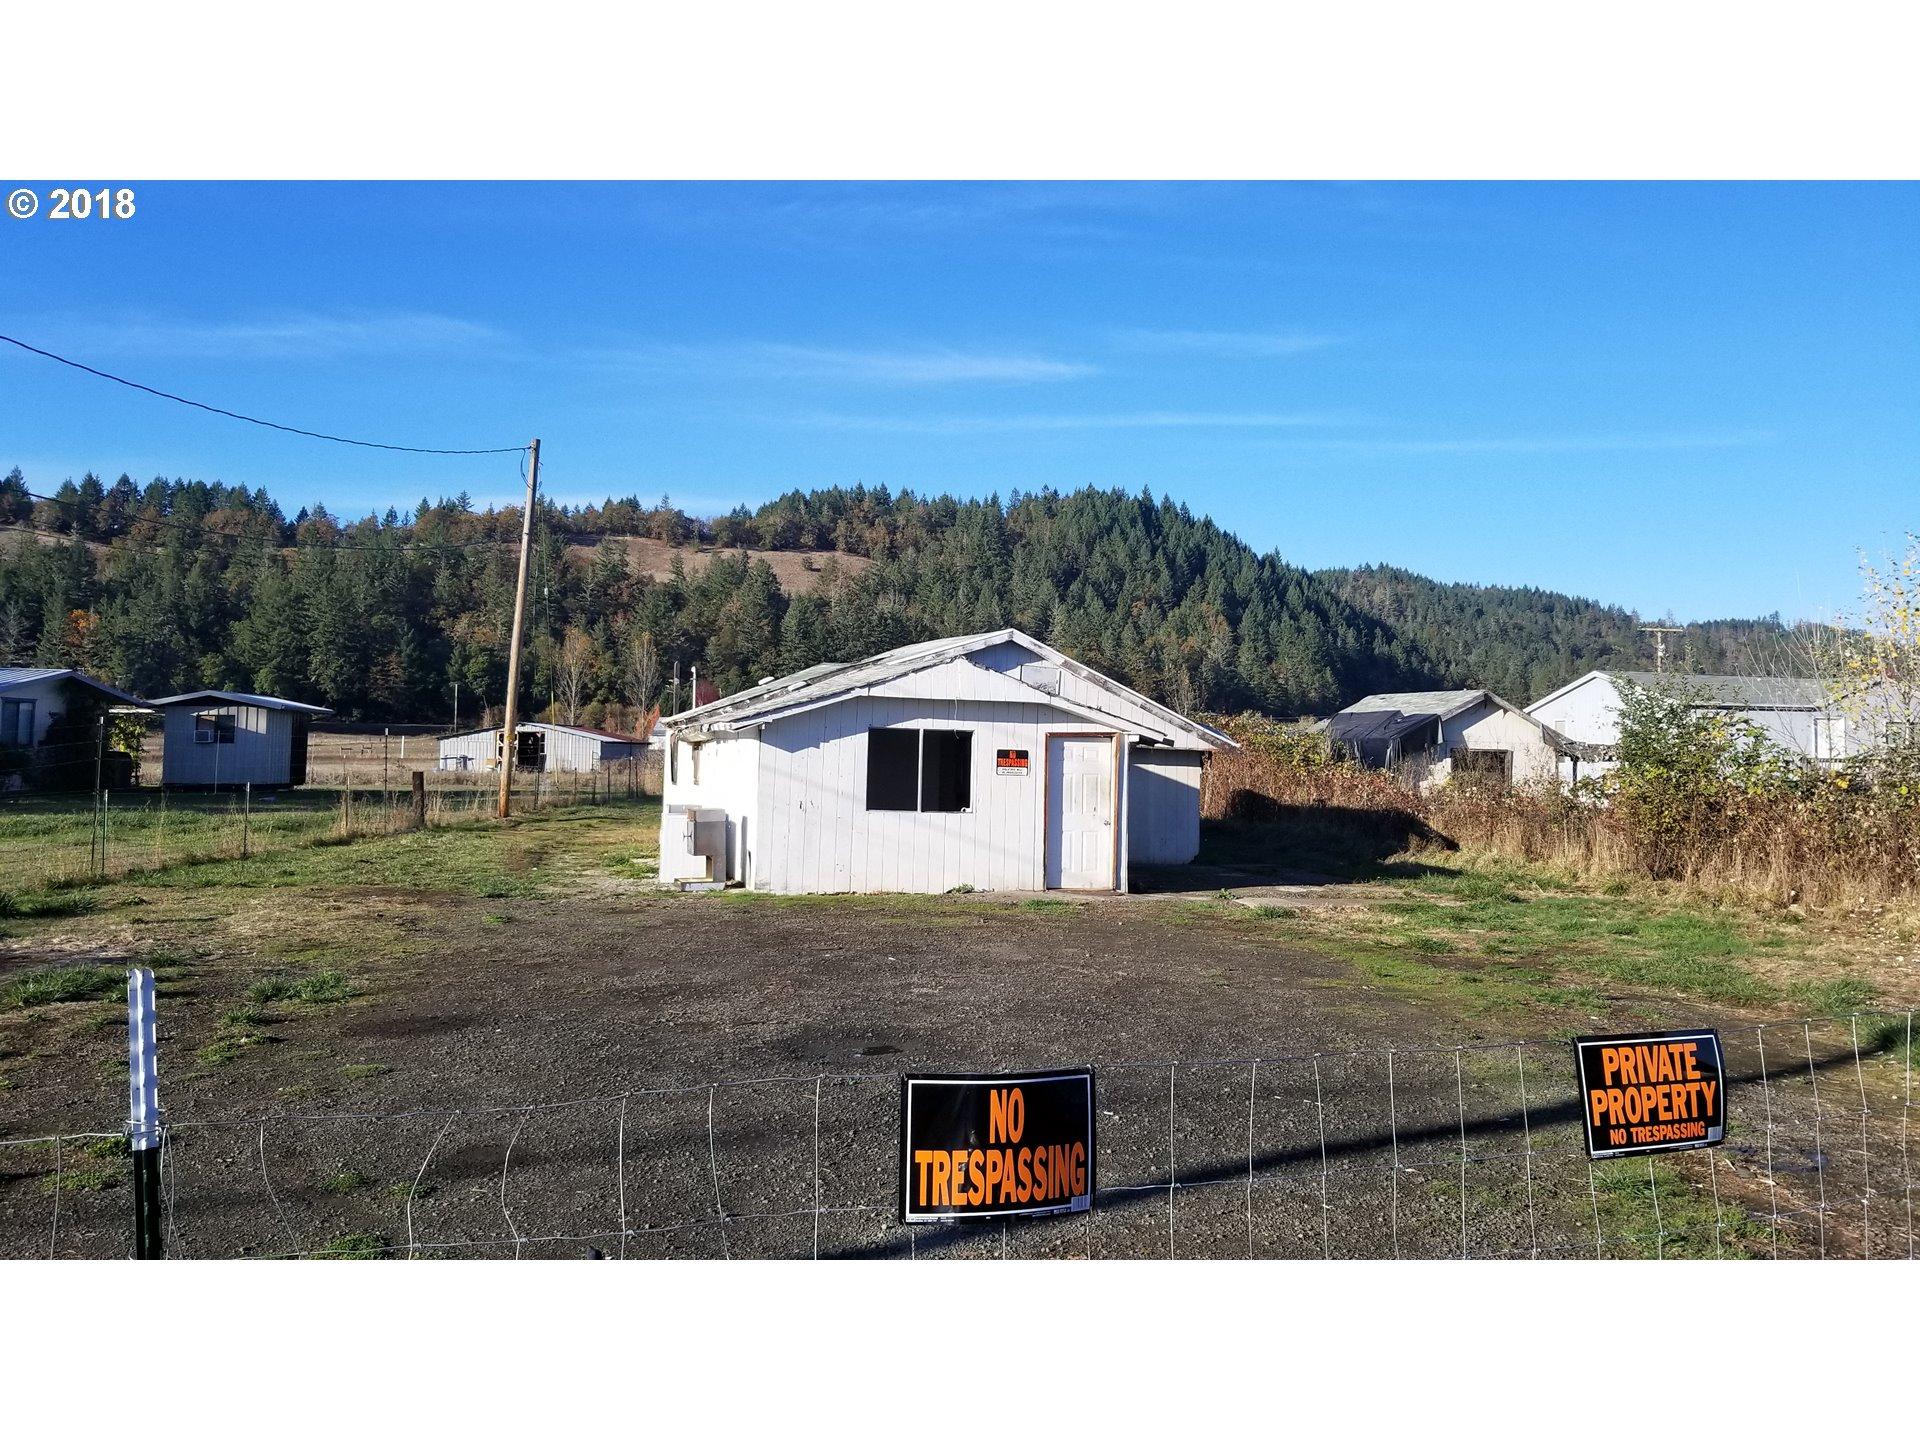 3630 NONPAREIL RD Sutherlin, OR 97479 - MLS #: 18635210